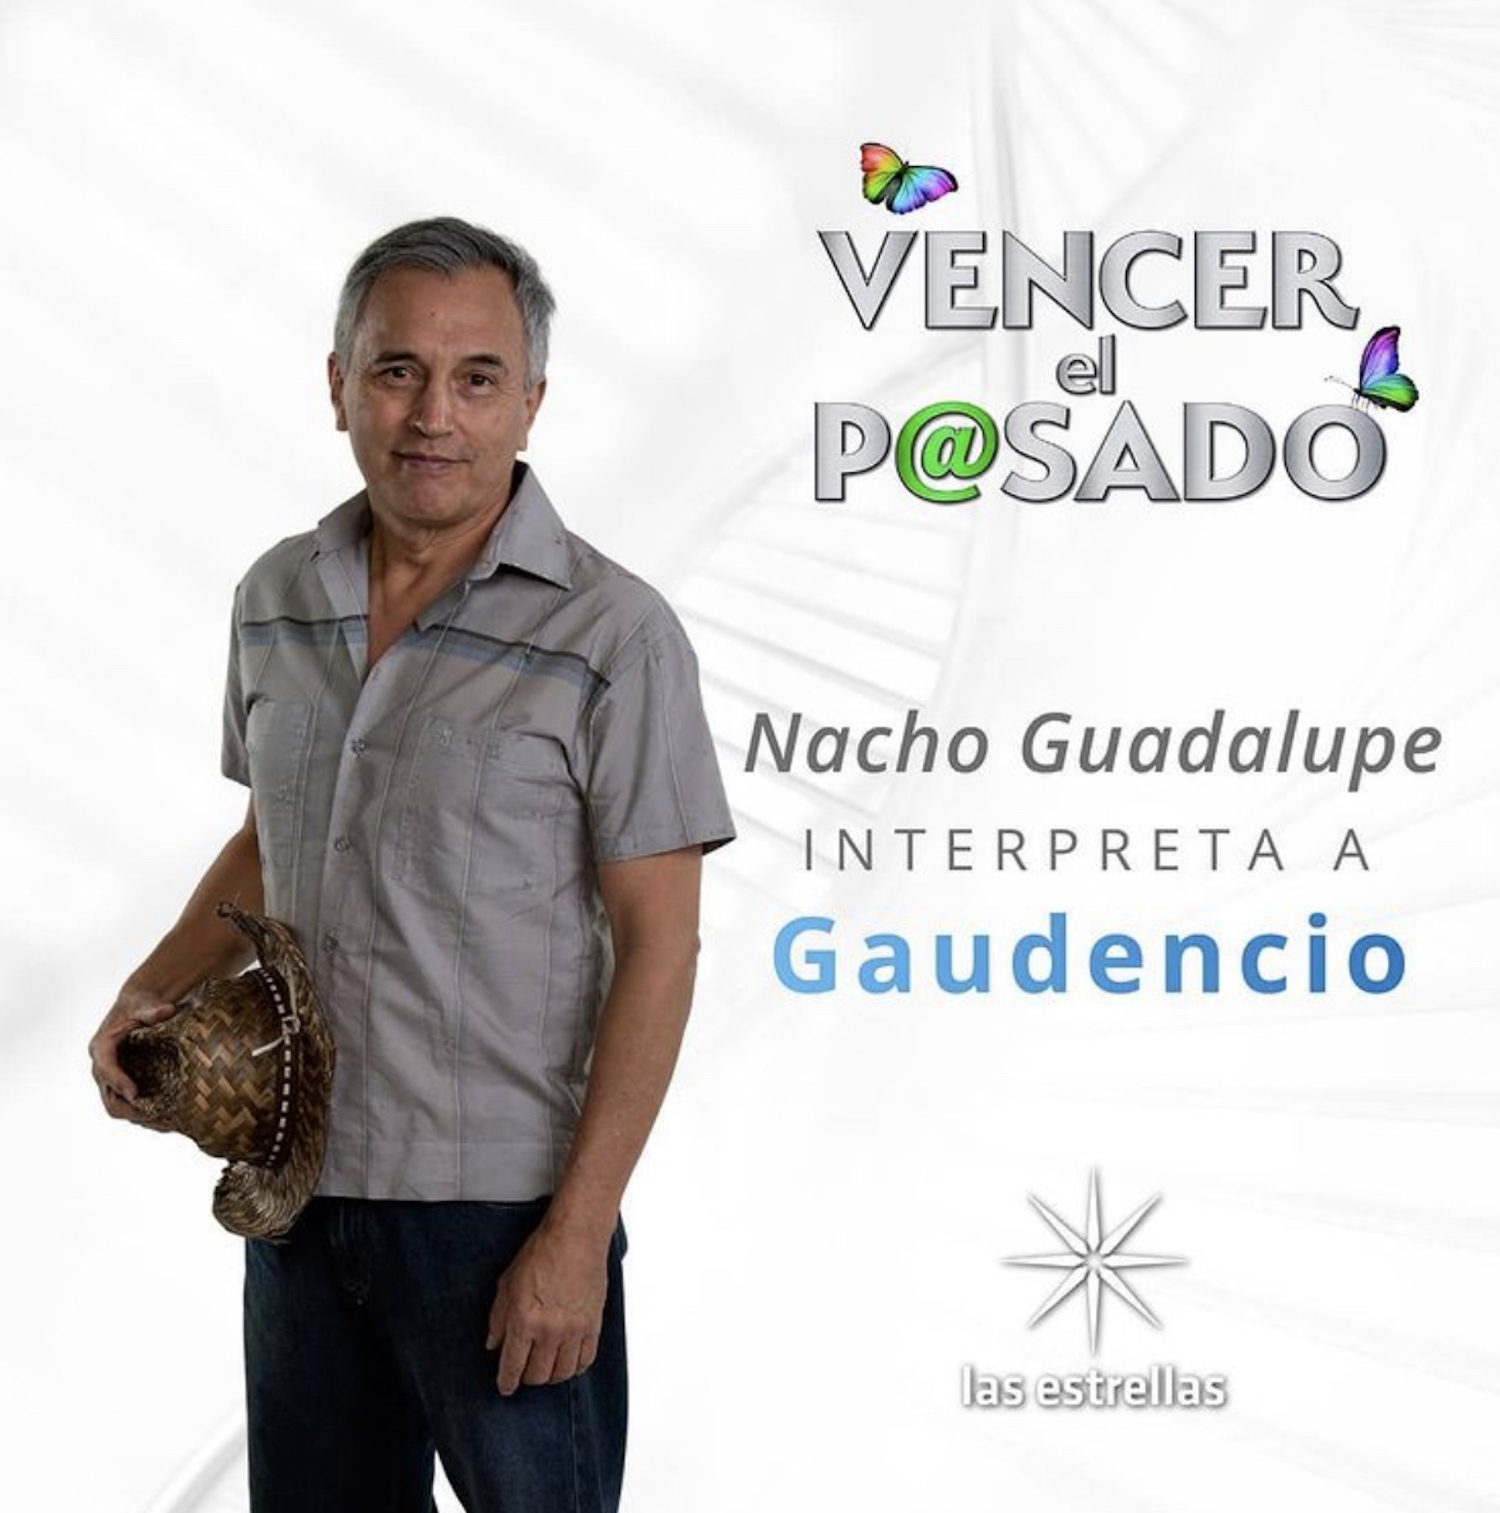 Nacho Guadalupe